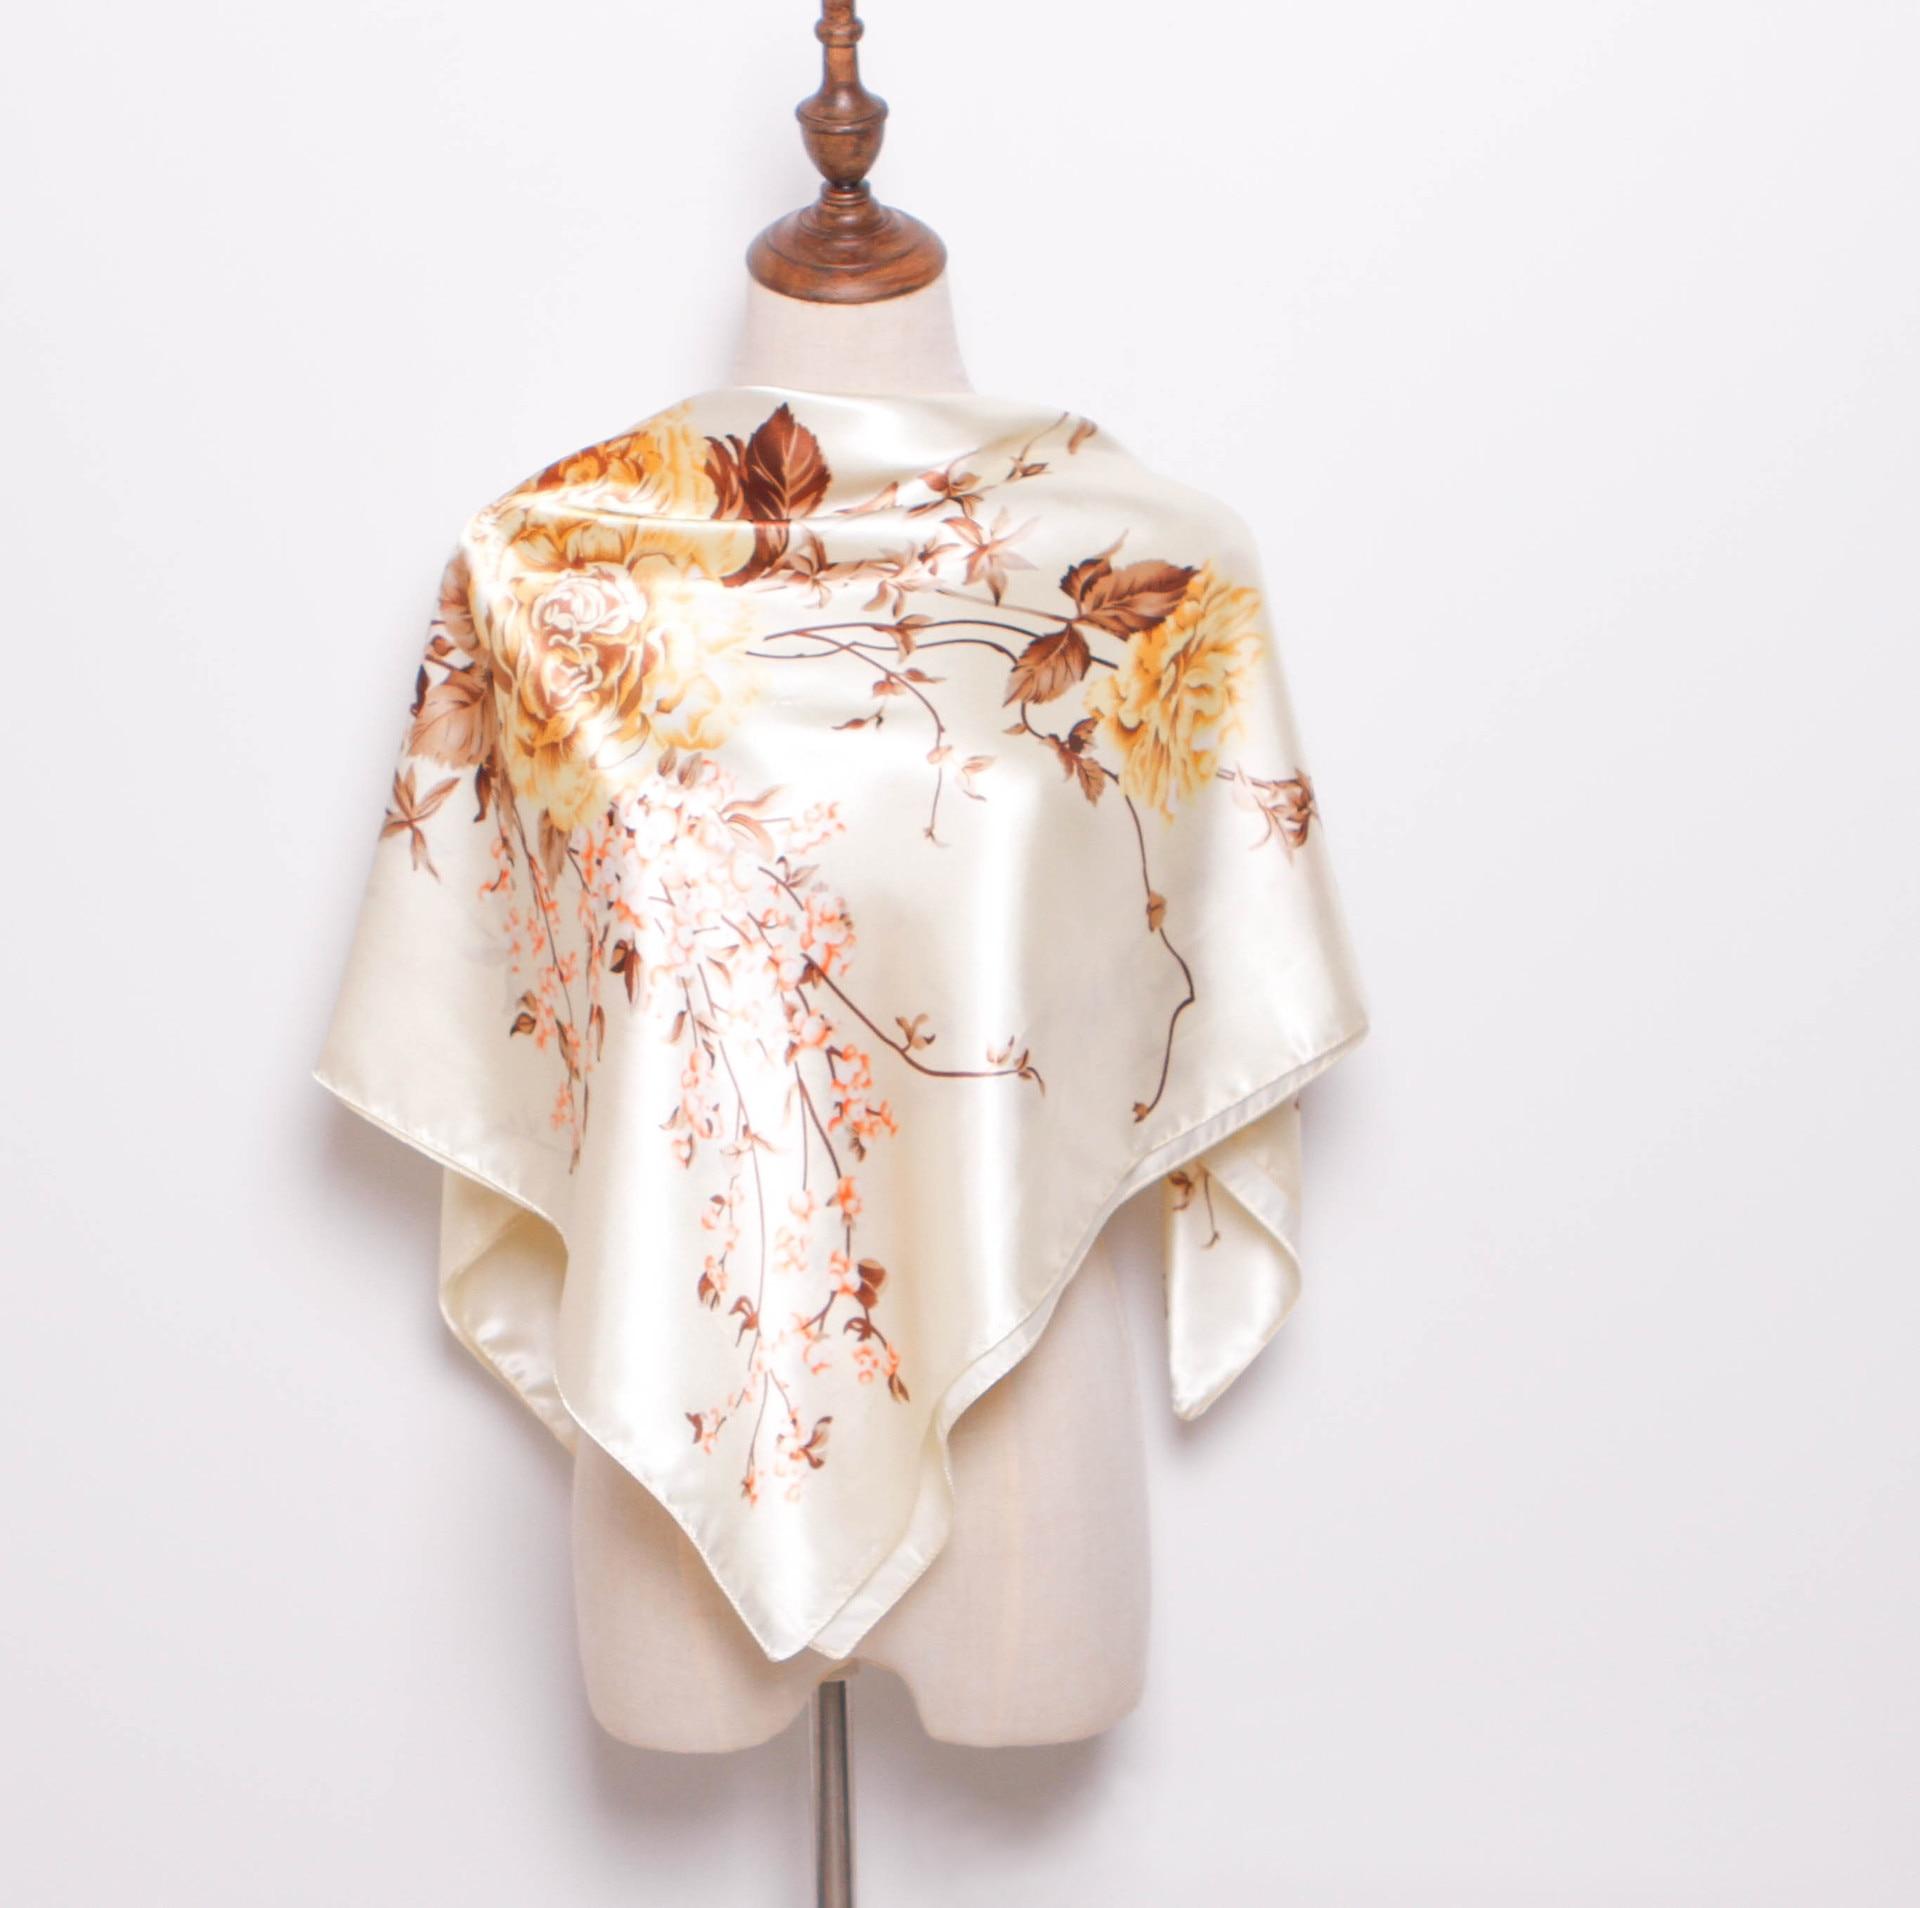 FXAASS Bandana Women Hijab Square Scarf Fashion Ladies Retro Luxury Silk Scarf Shawls Flower Print 90*90cm Large Cape Headscarf